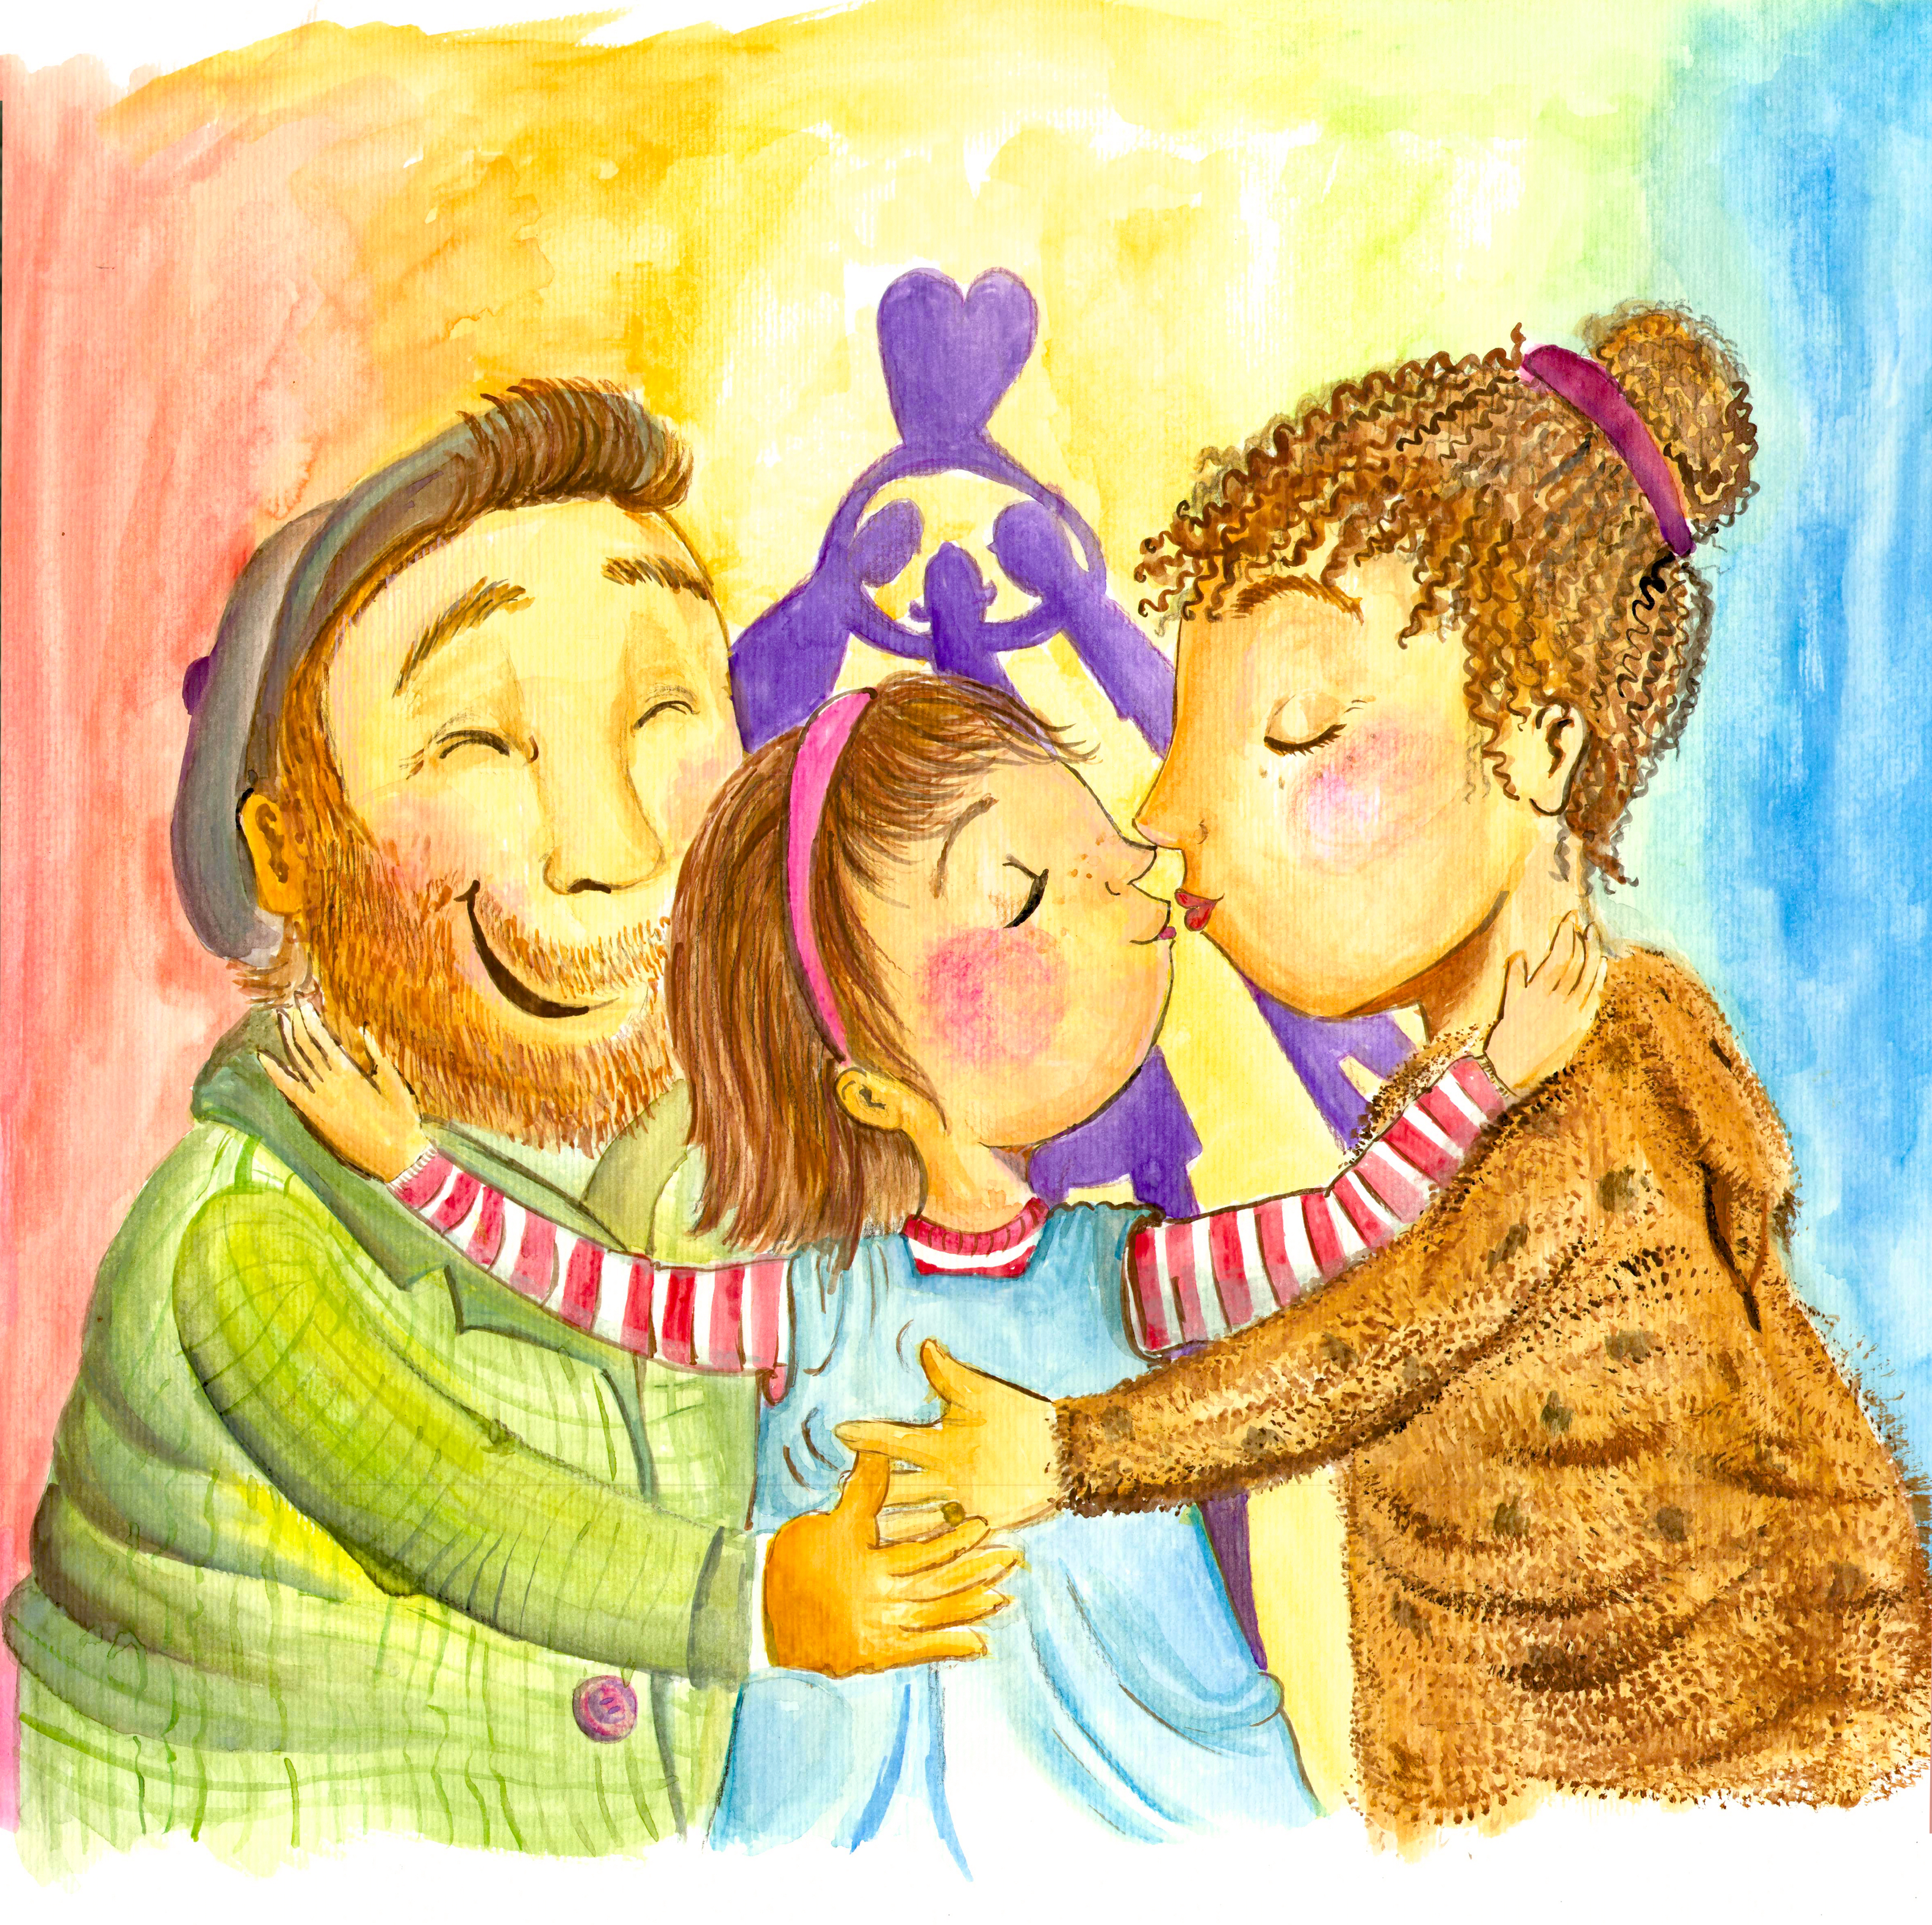 Kleine Familie, Illustratorin Vida Sprenger vidART.ch